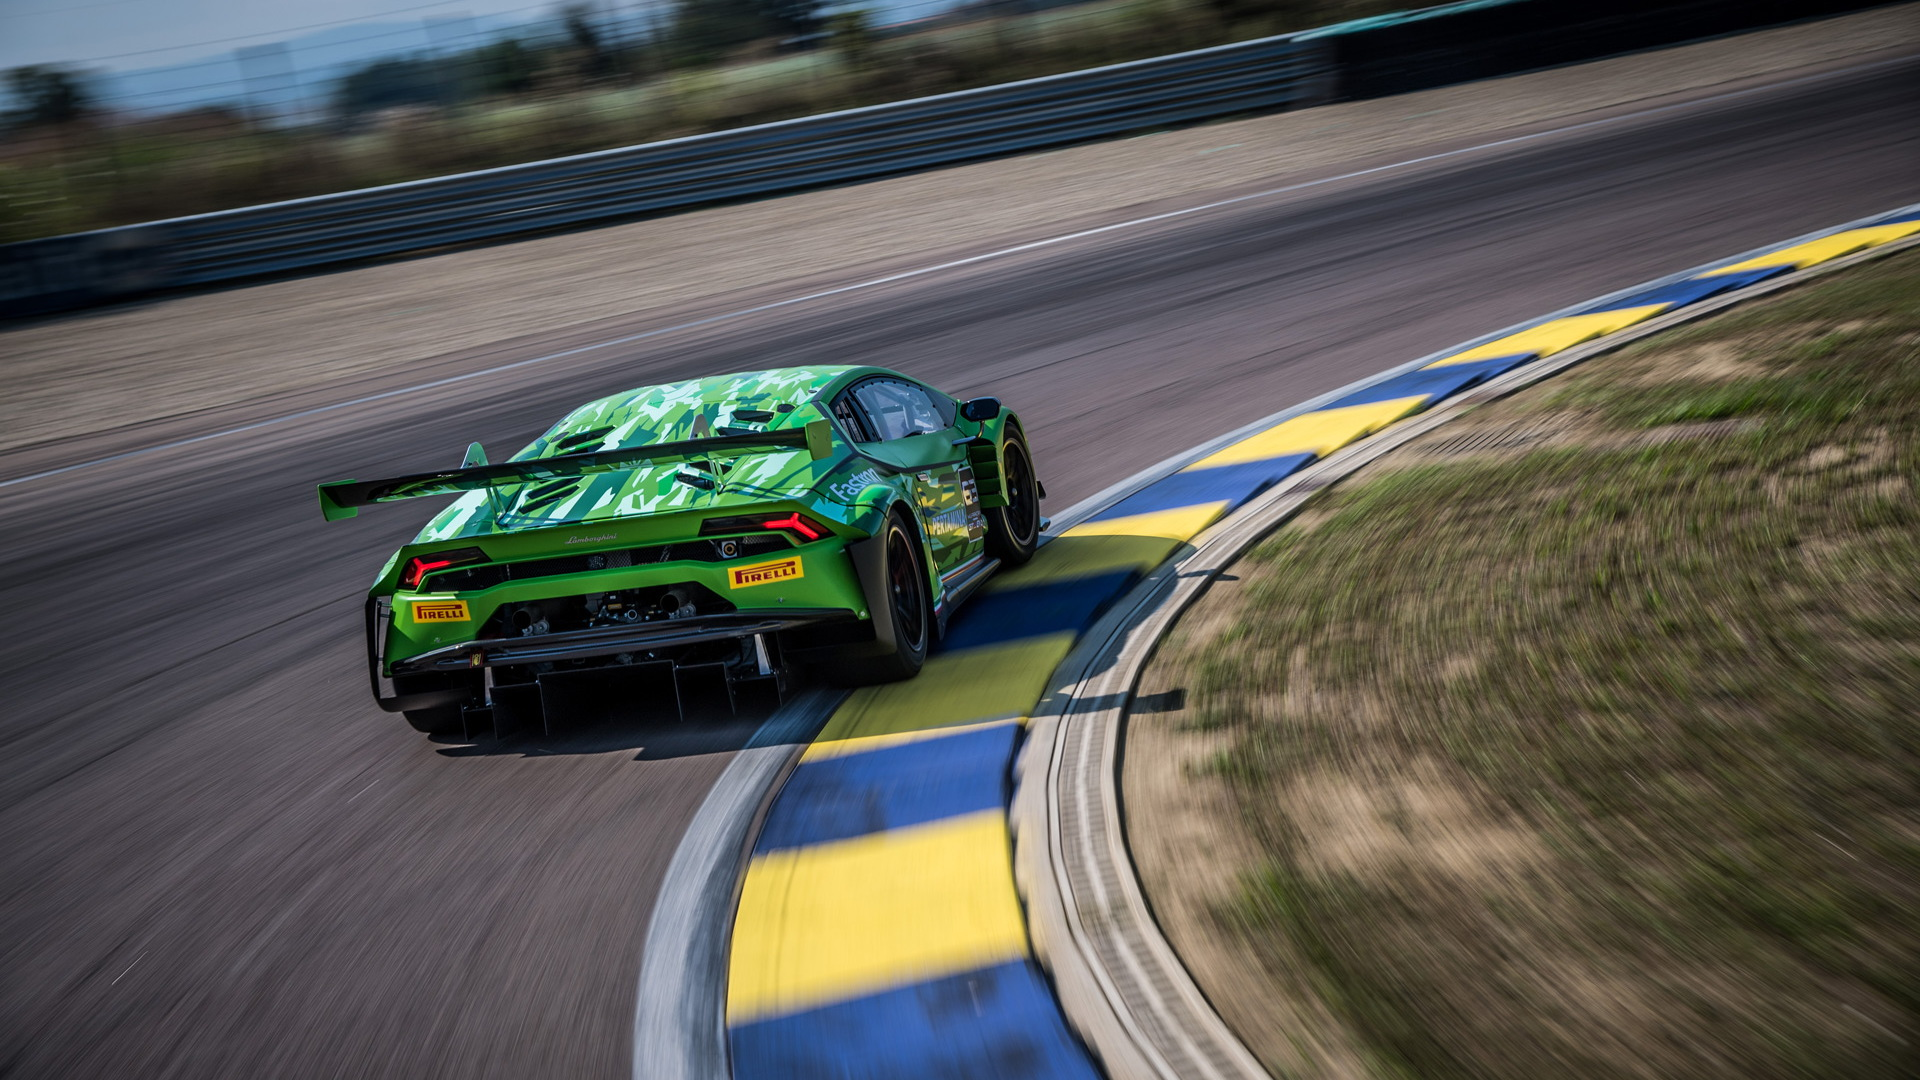 2019 Lamborghini  Huracán GT3 Evo